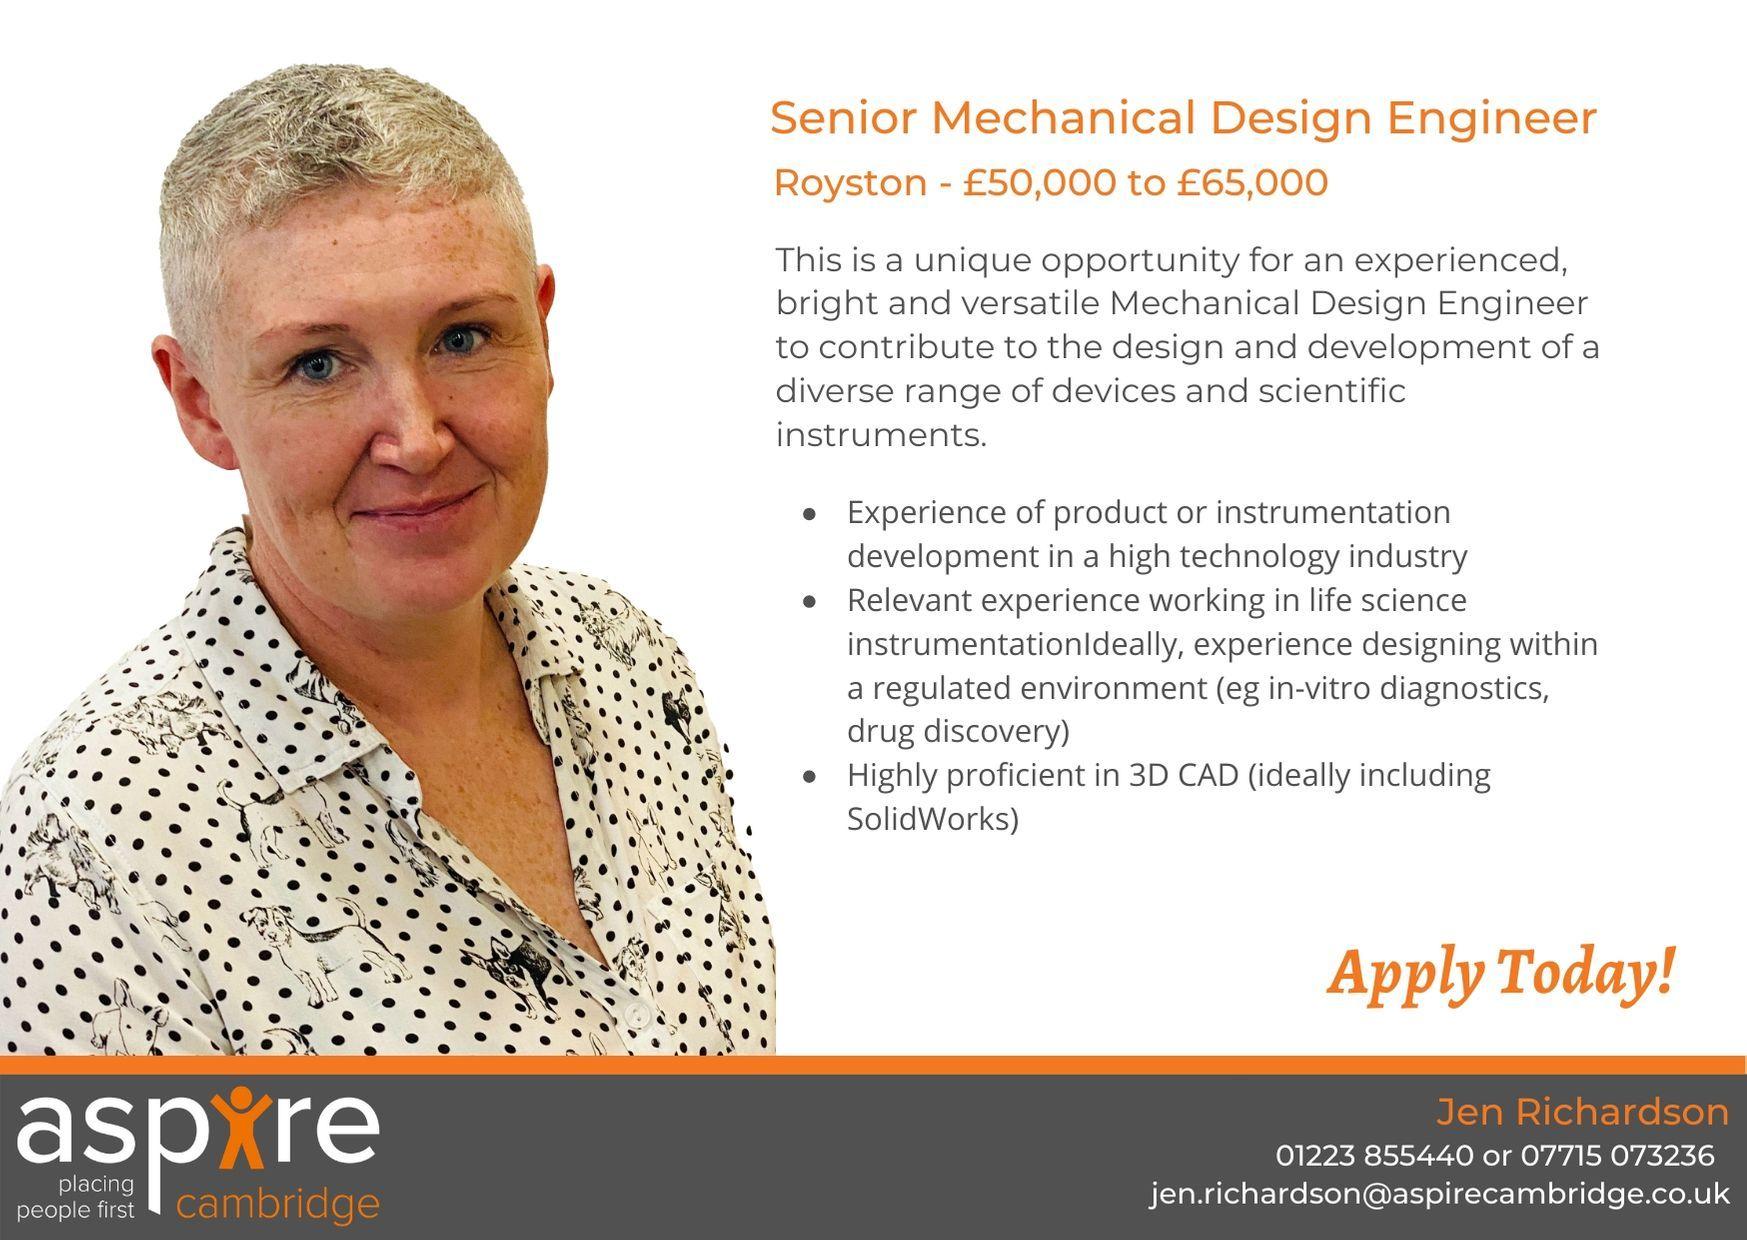 Senior Mechanical Design Engineer, Royston £50,000 to £